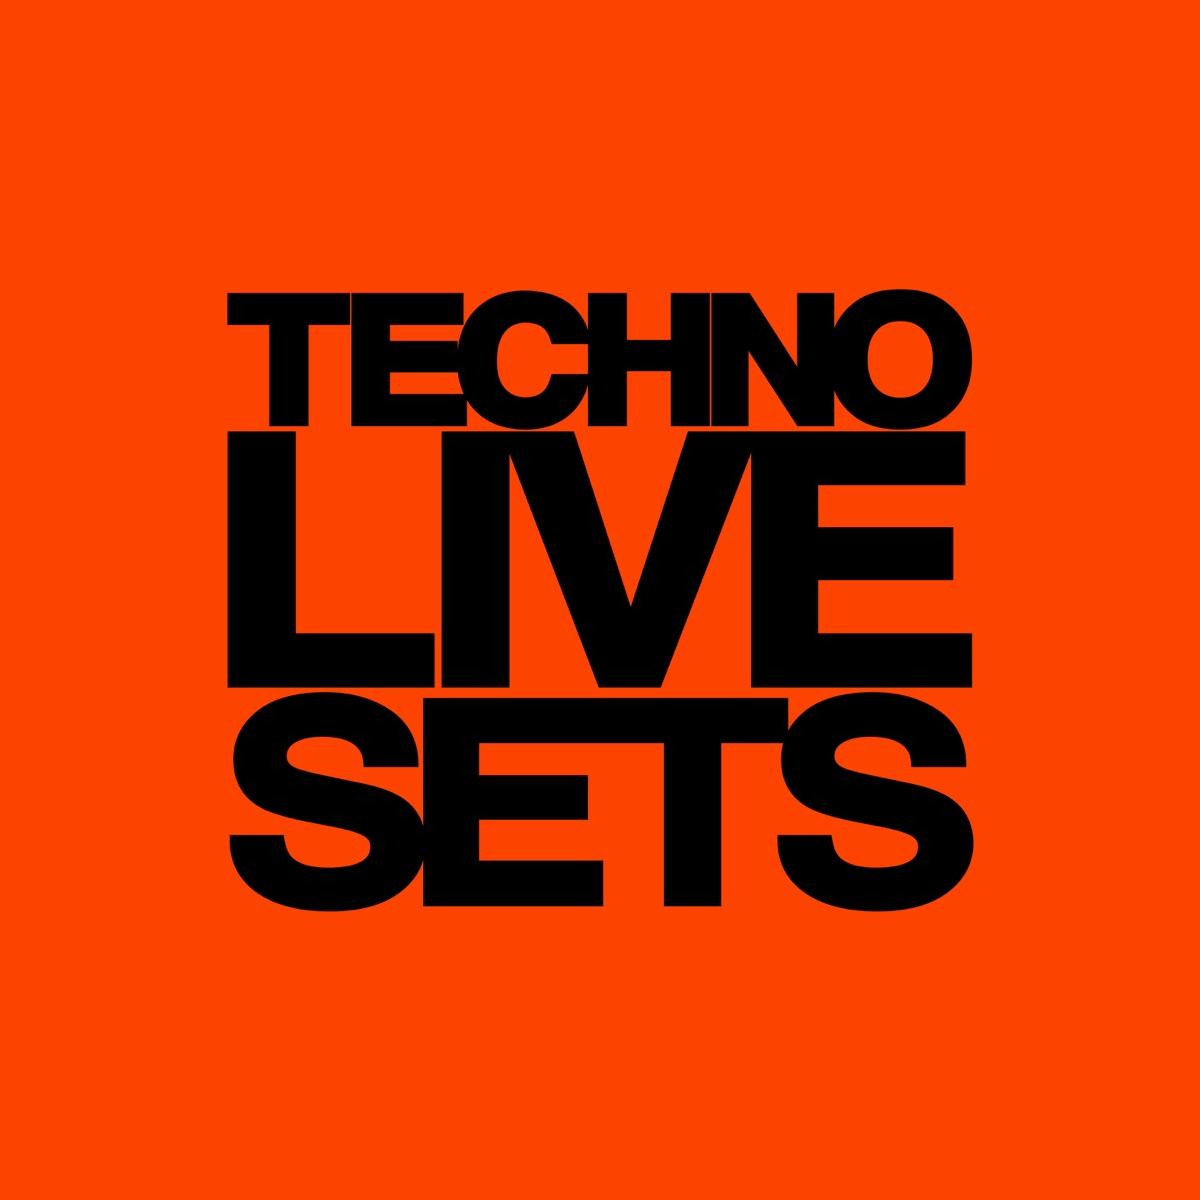 Techno Music DJ Mix / Sets - Techno Live Sets